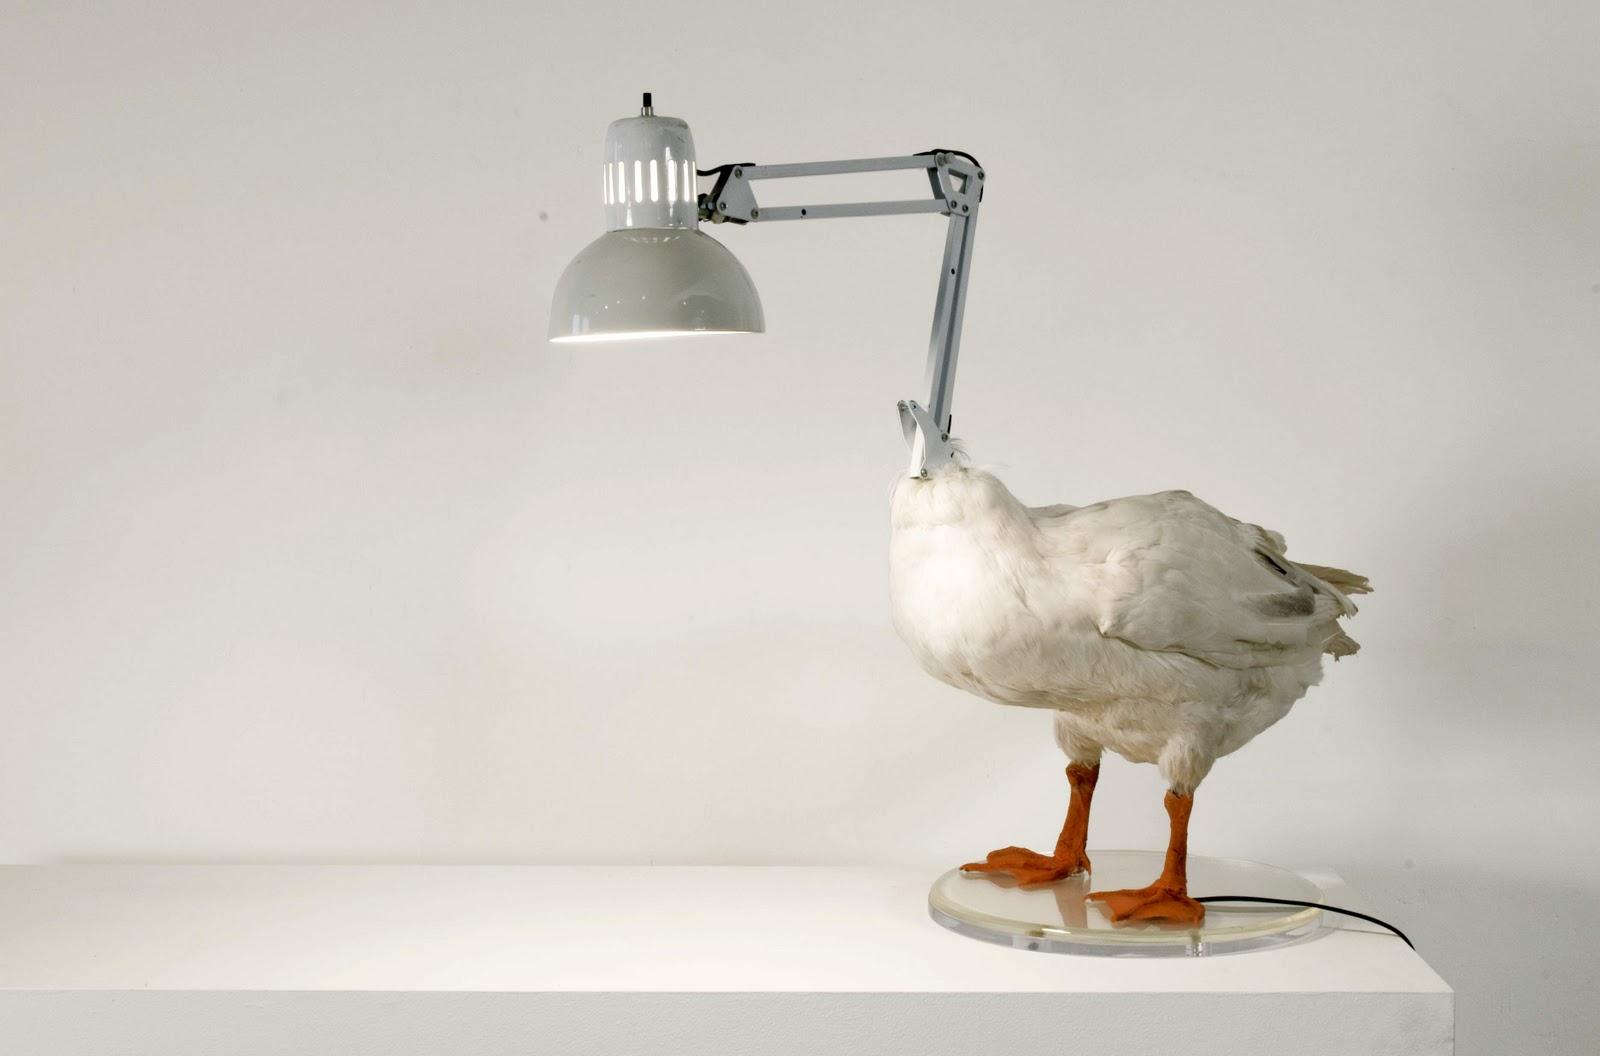 Weird Shaped Chairs Swivel Round Chair My Art Glass World Looks Like Animals Unusual Animal